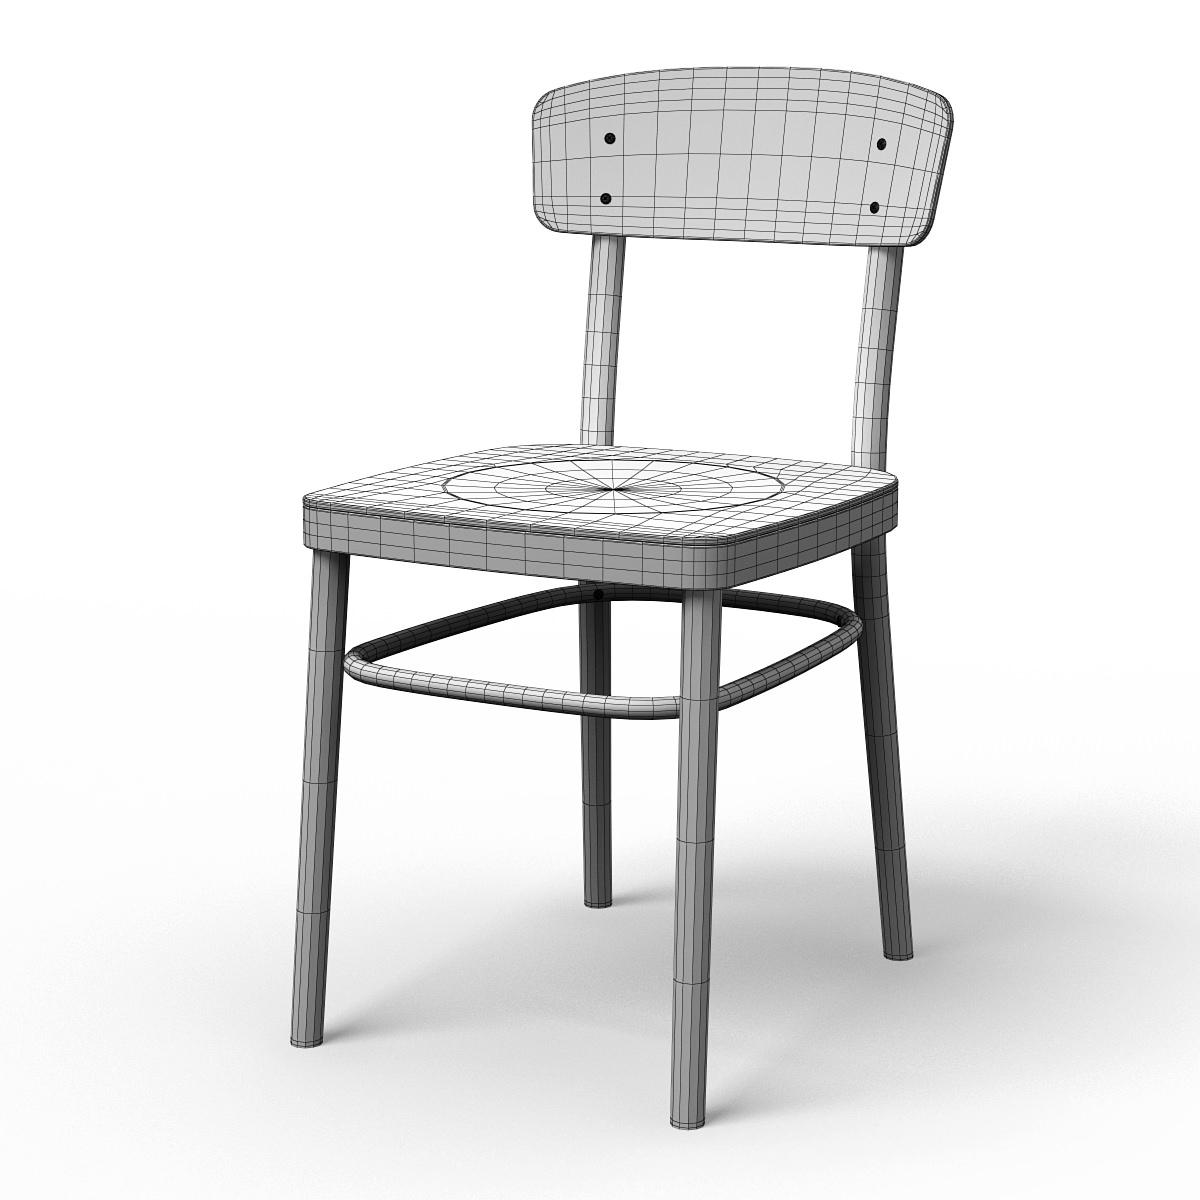 Idolf Dining Chair 3d Model Max Obj 3ds Fbx Cgtrader Com